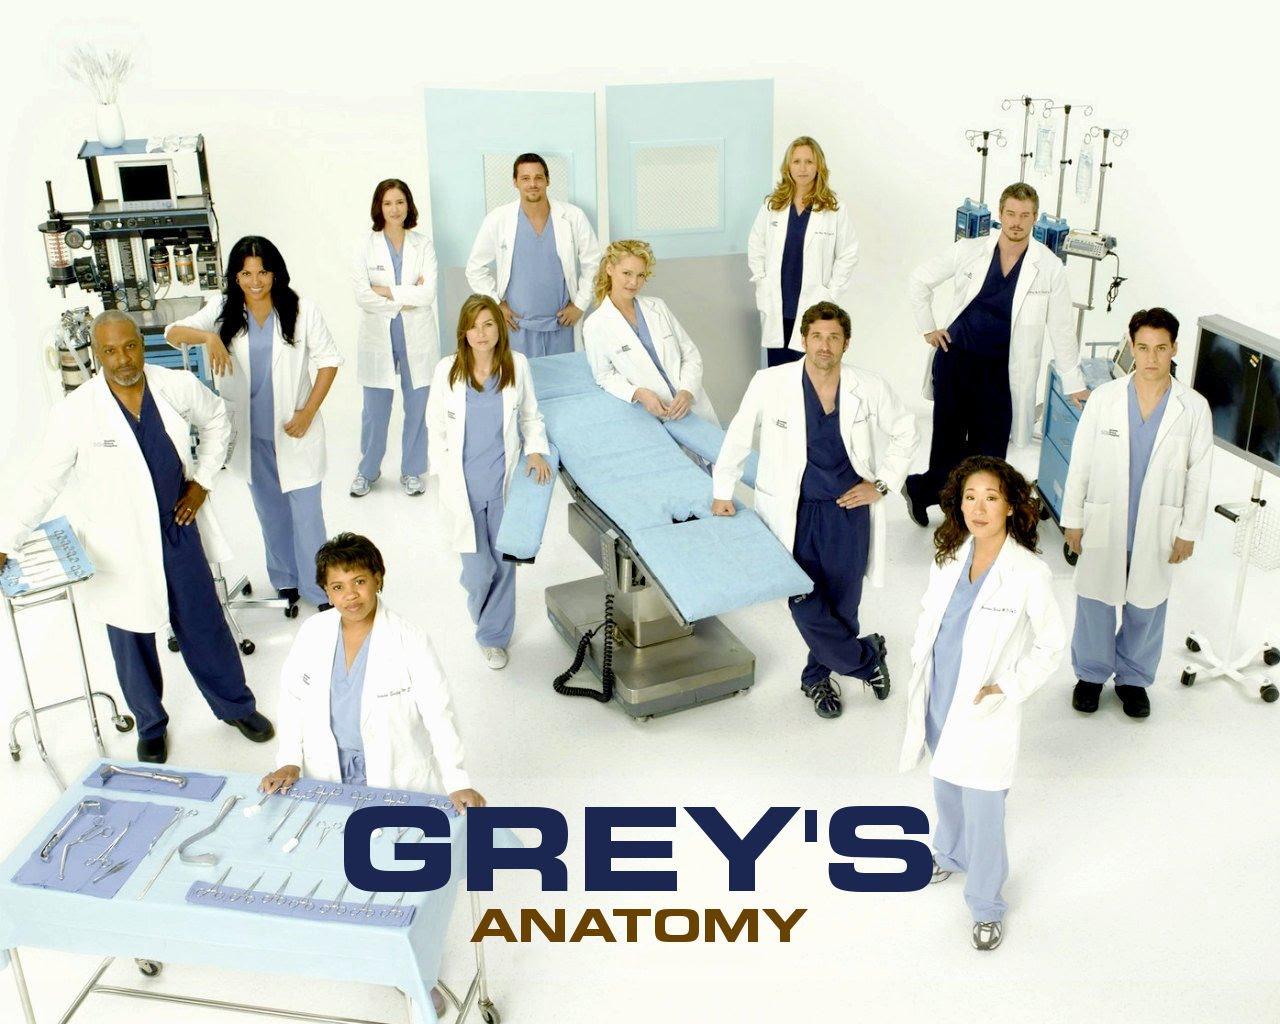 Greys Anatomy wallpaper 14